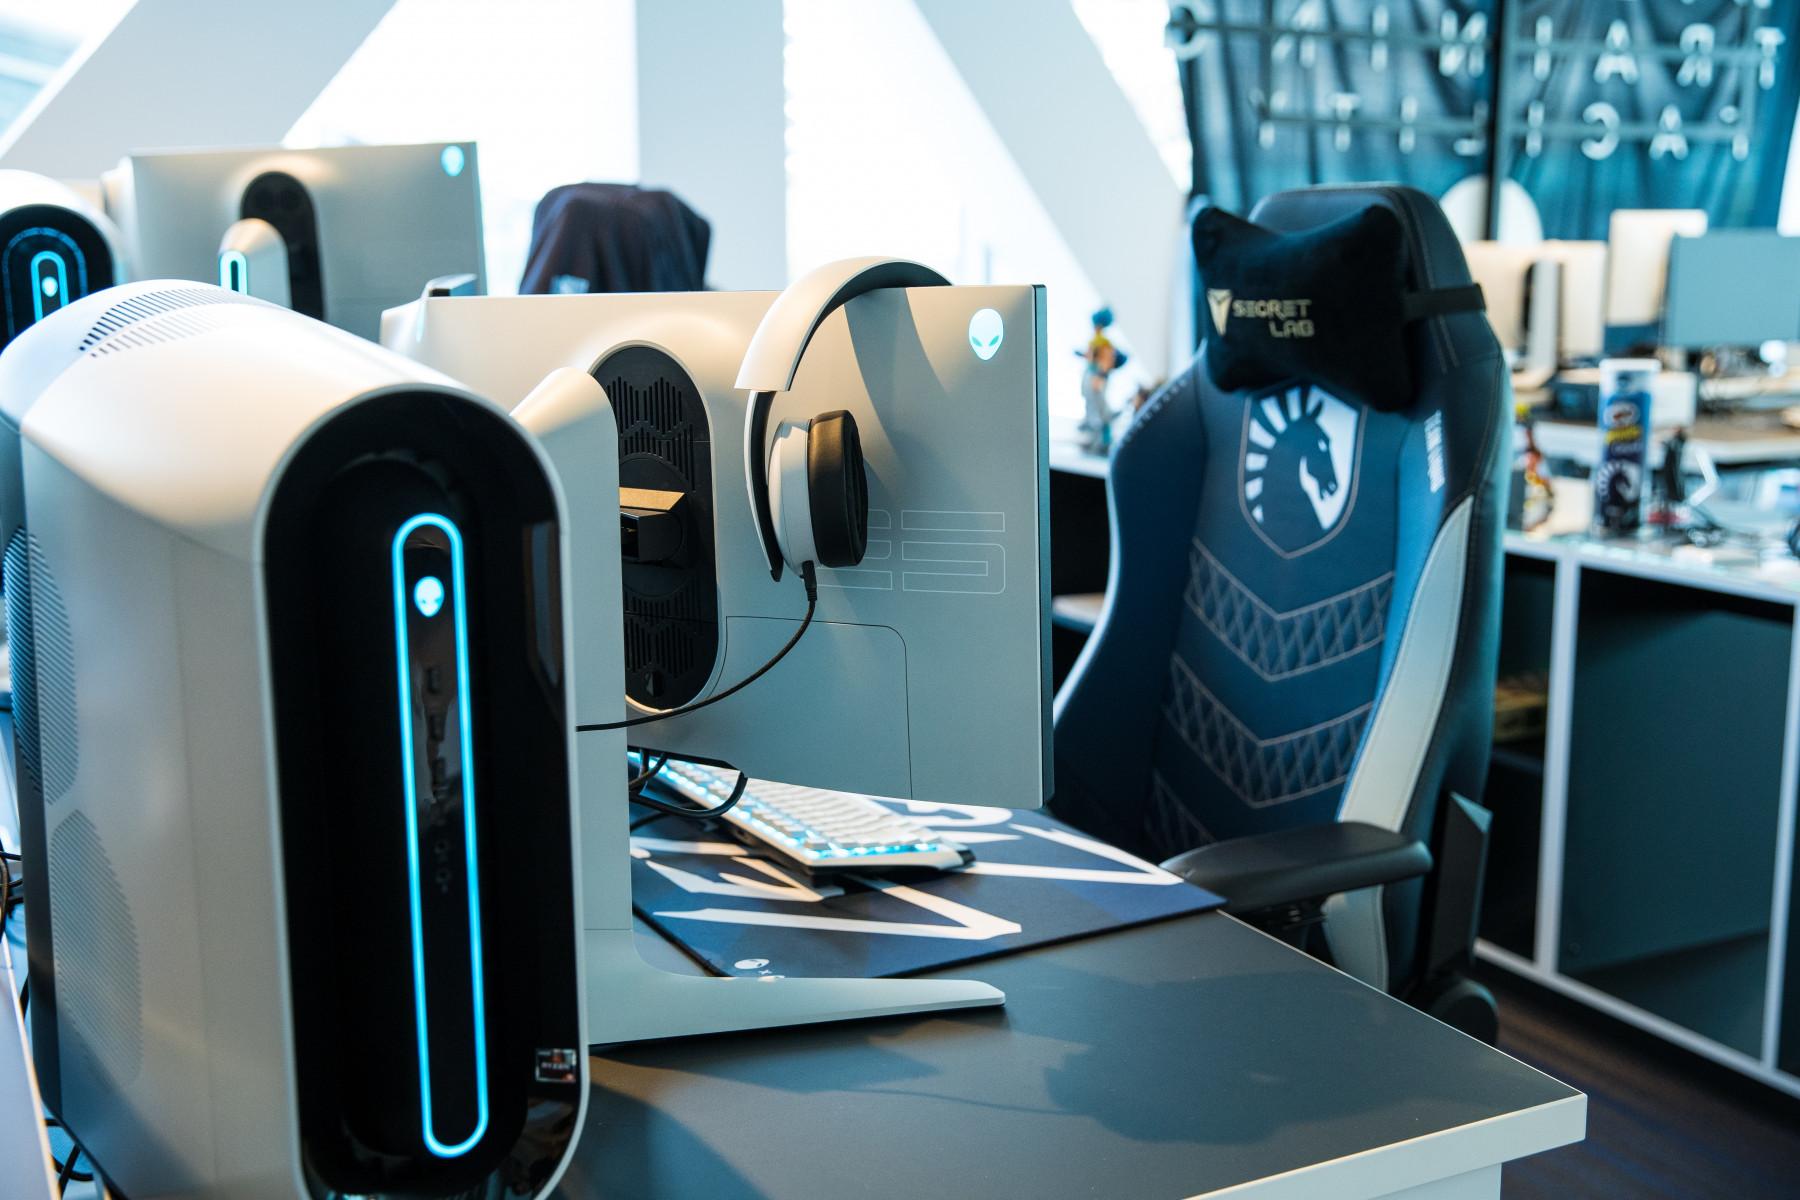 AlienWare Training Facility EU - Team Liquid Open Office